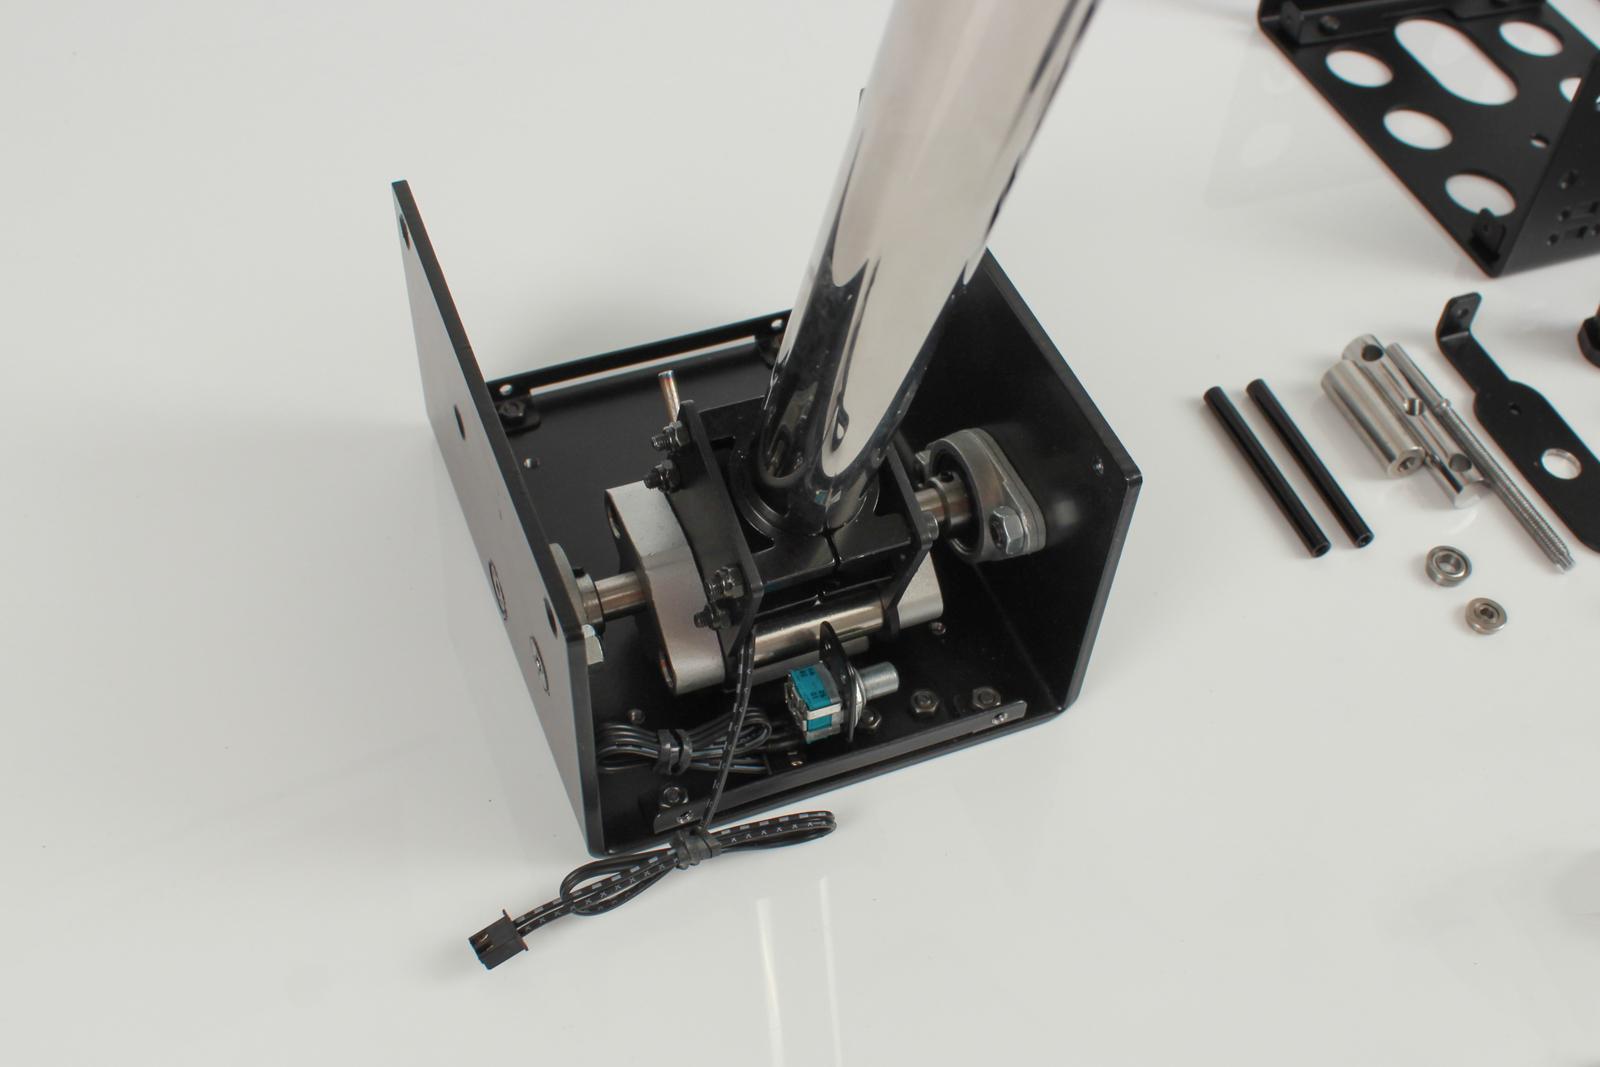 Custom Sim Racing Handbrake for PS3/PS4/PC | RaceDepartment - Latest